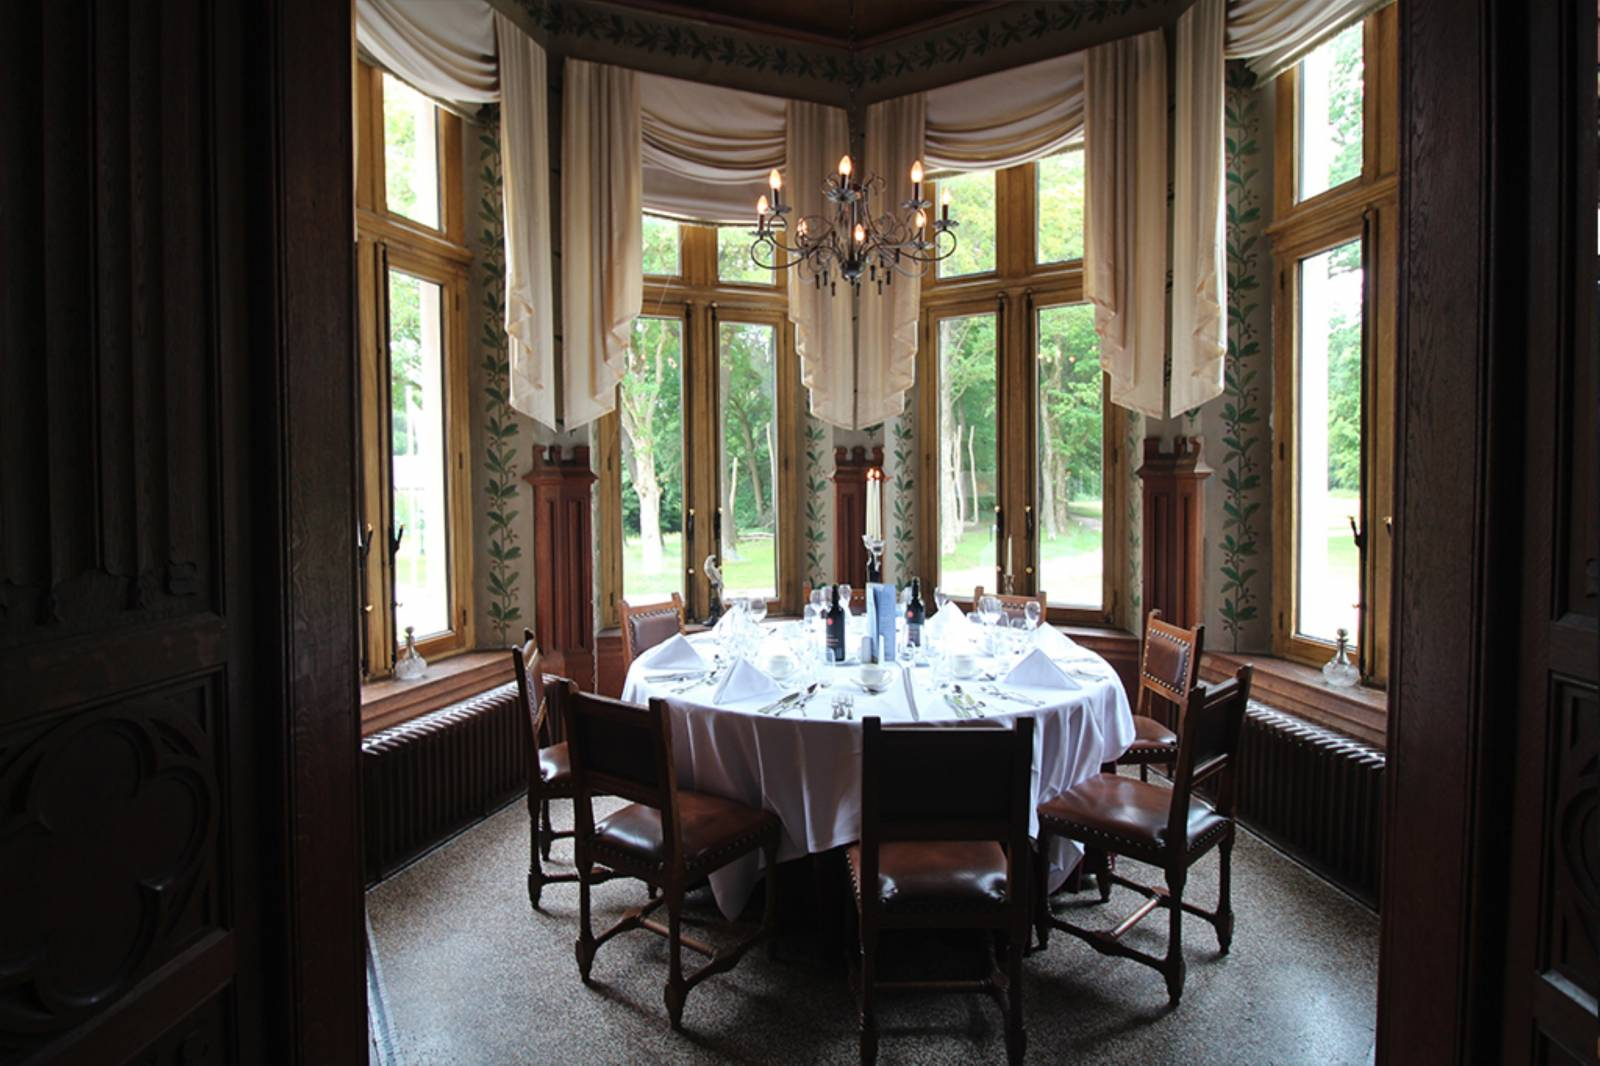 Kasteel D'artrycke - Feestzaal - House of Weddings (10)